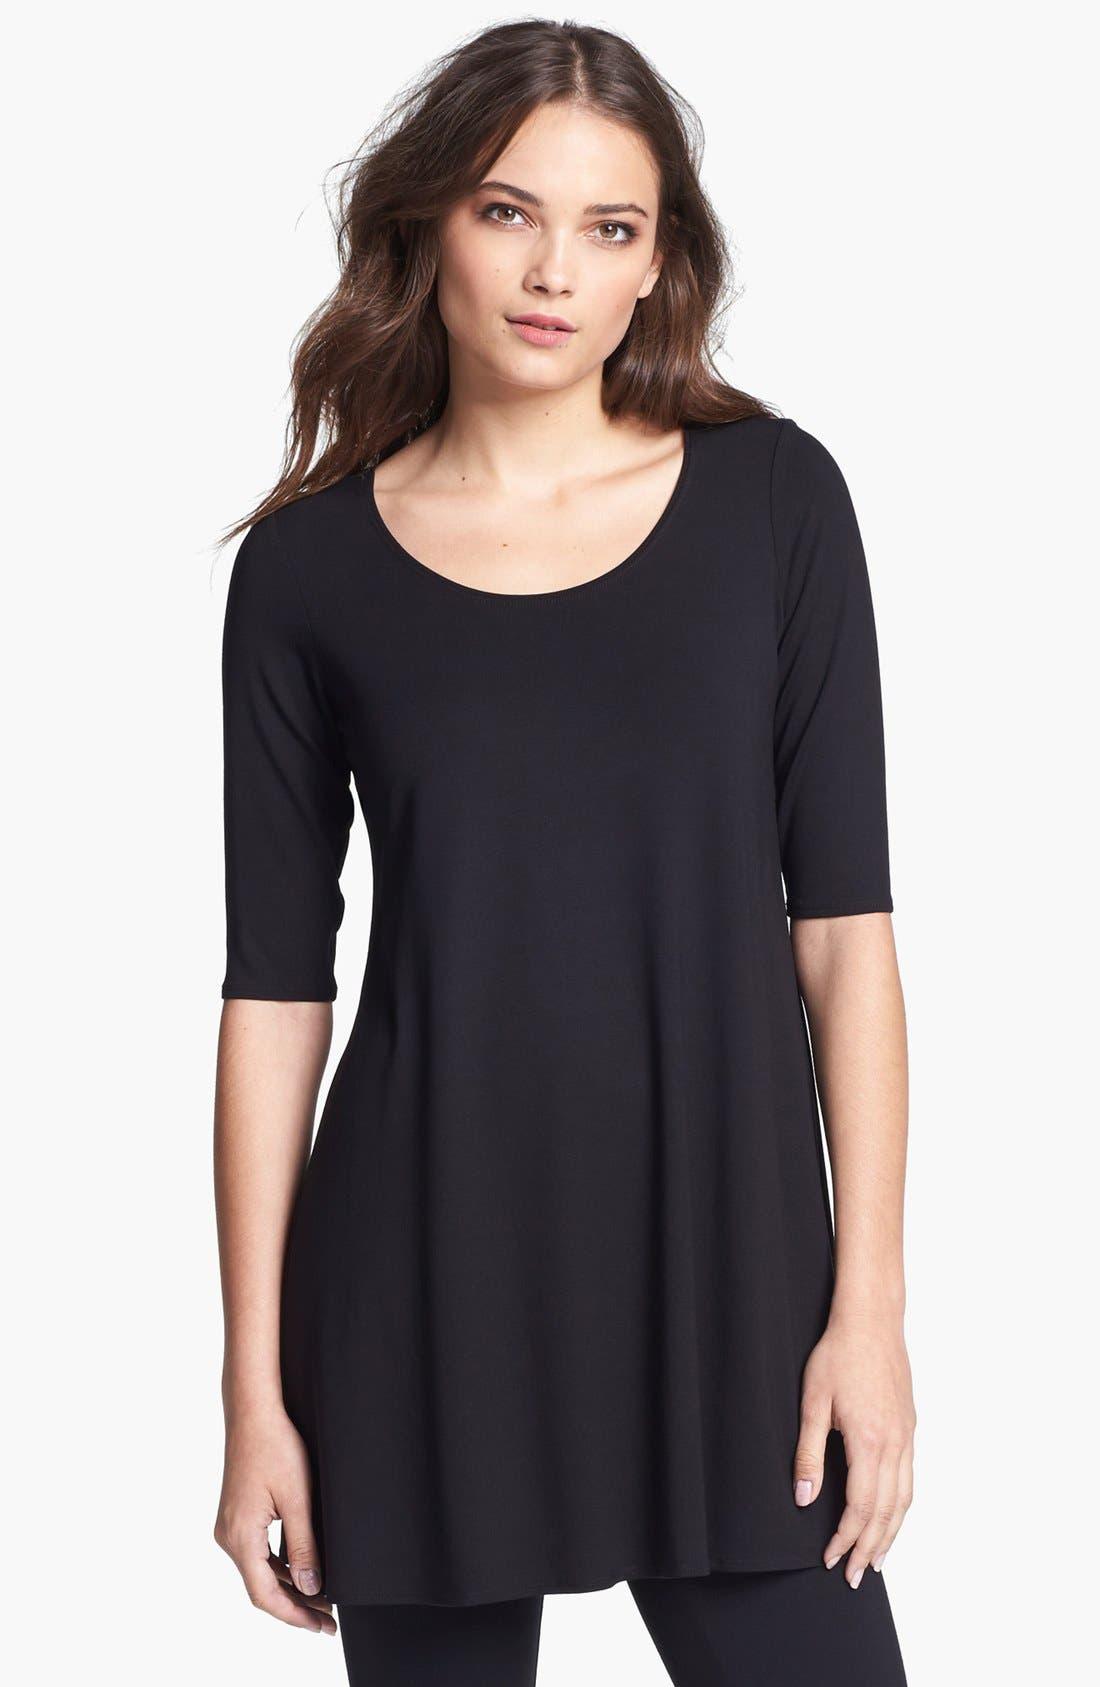 Alternate Image 1 Selected - Eileen Fisher Scoop Neck Jersey Tunic (Regular & Petite)